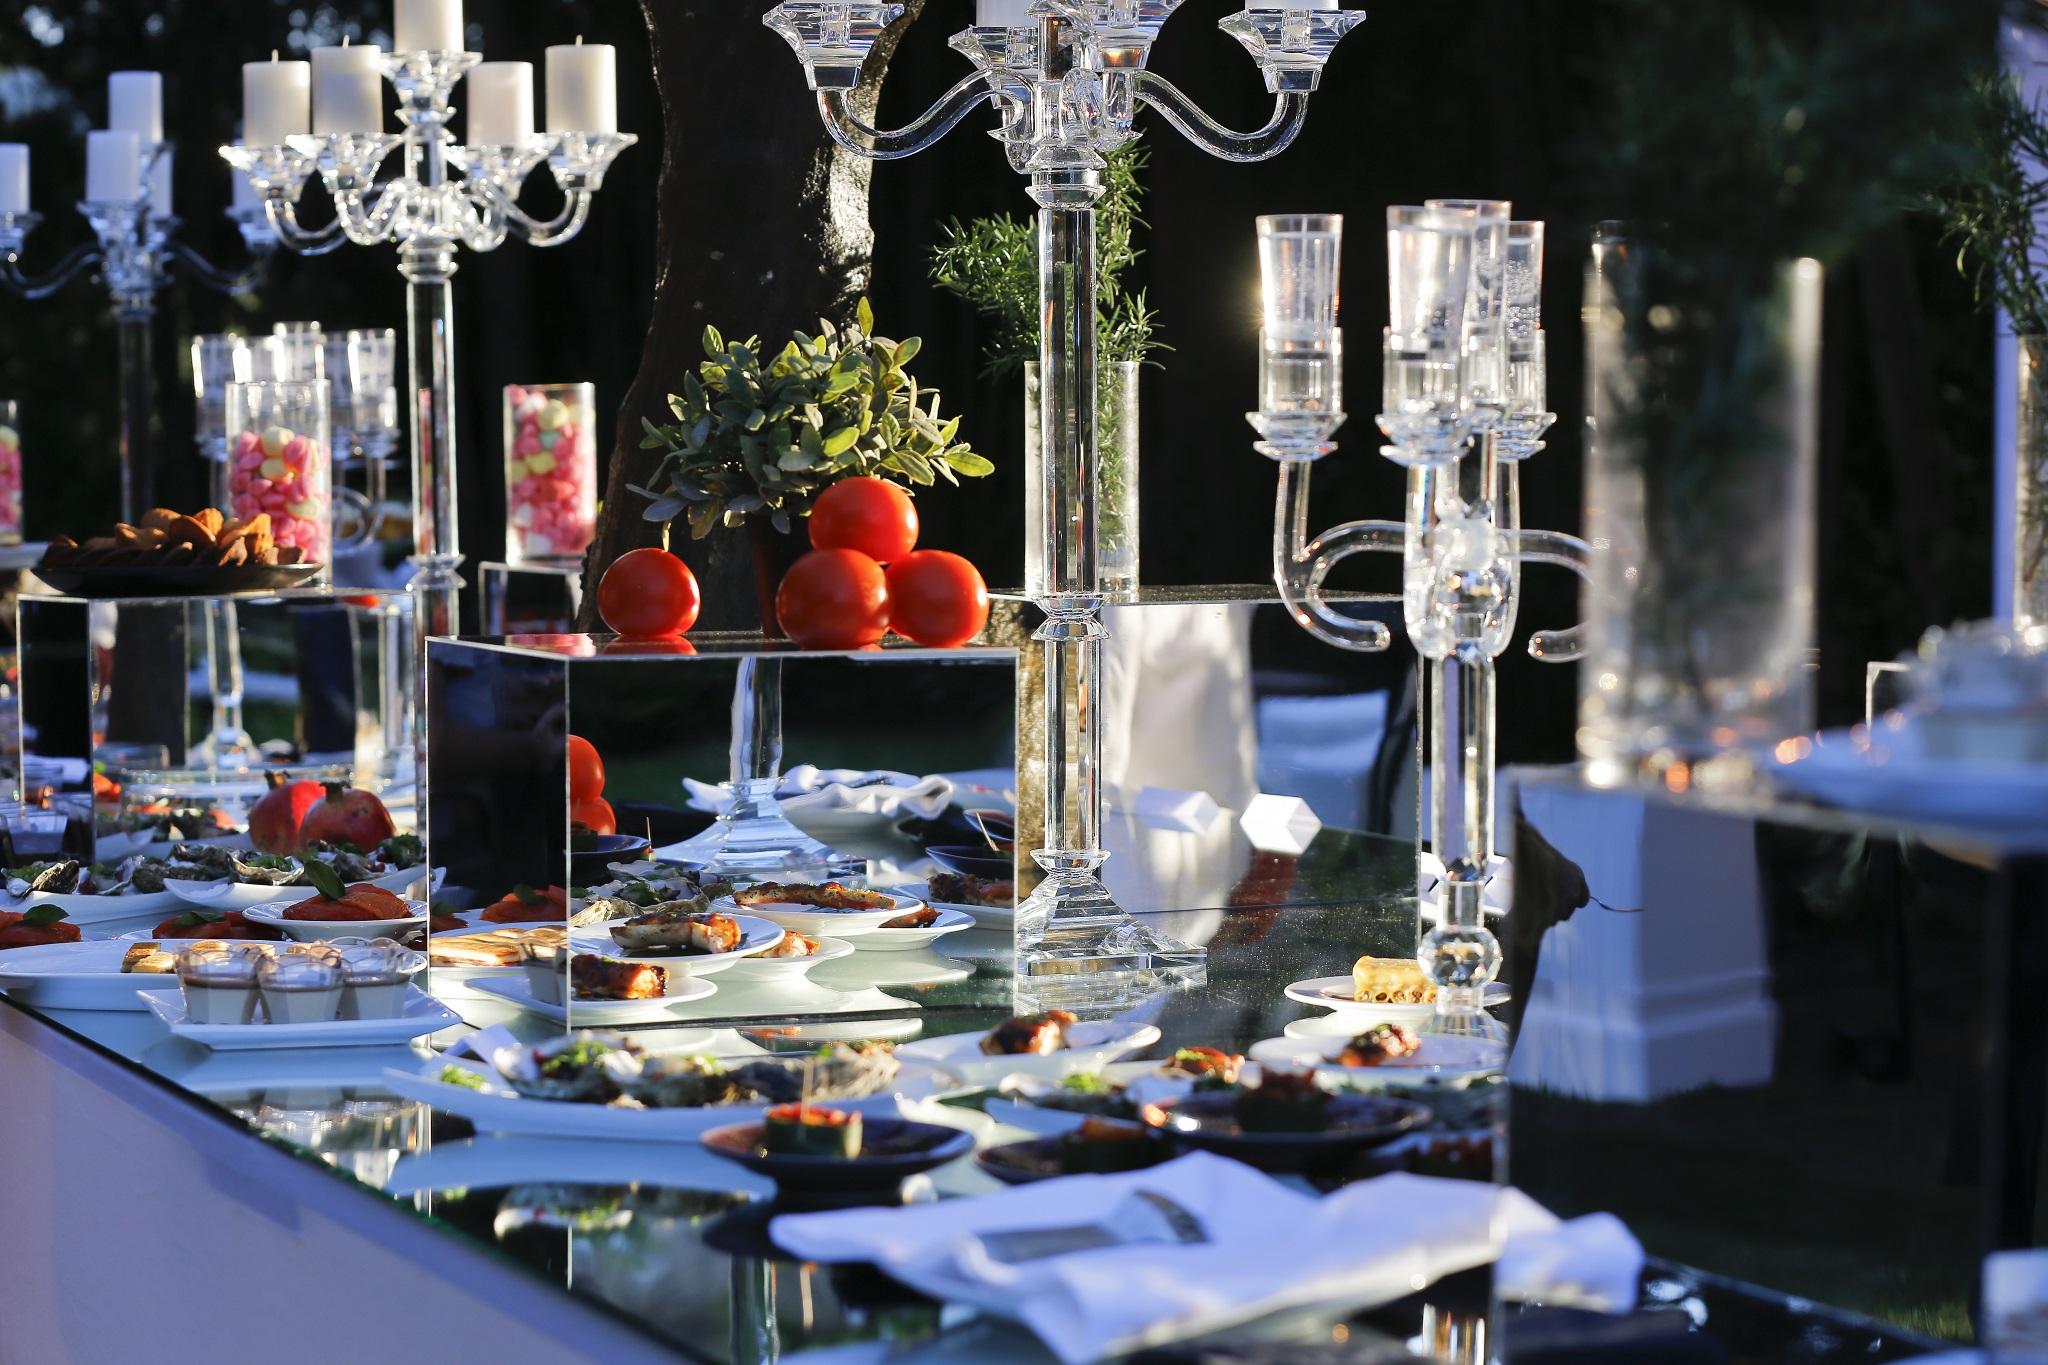 les-moulins-de-ramatuelle-lifestyleblog-buffet-decoration-catering-st-tropez-buffedekoration-lieblingsstil8